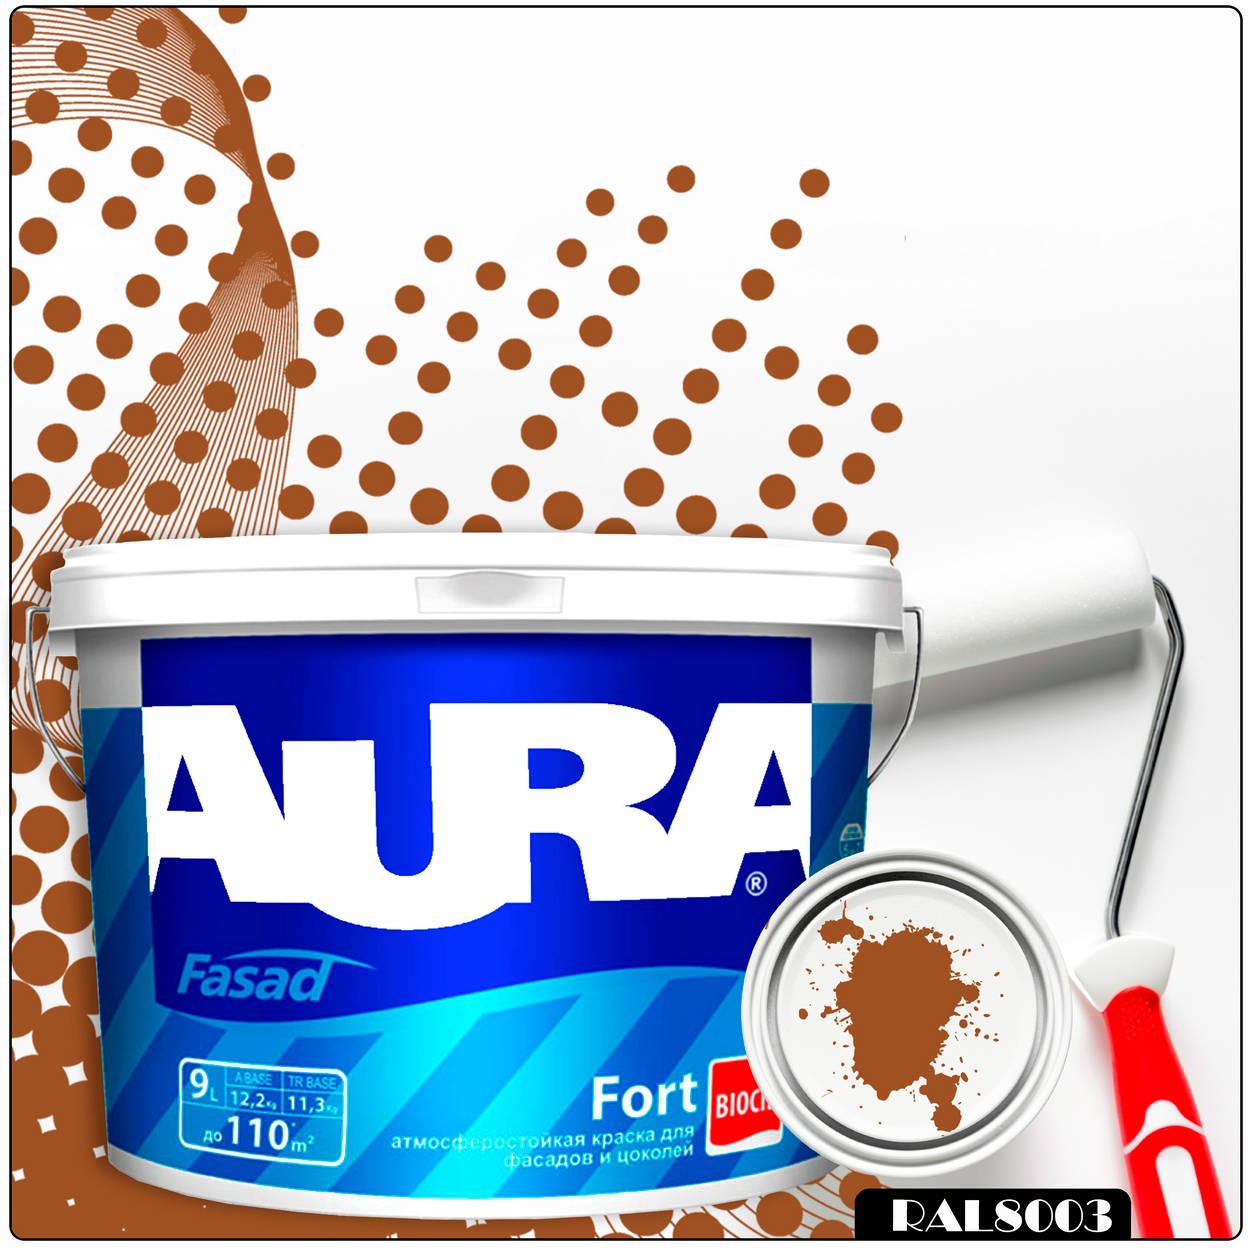 Фото 3 - Краска Aura Fasad Fort, RAL 8003 Коричневая глина, латексная, матовая, для фасада и цоколей, 9л, Аура.